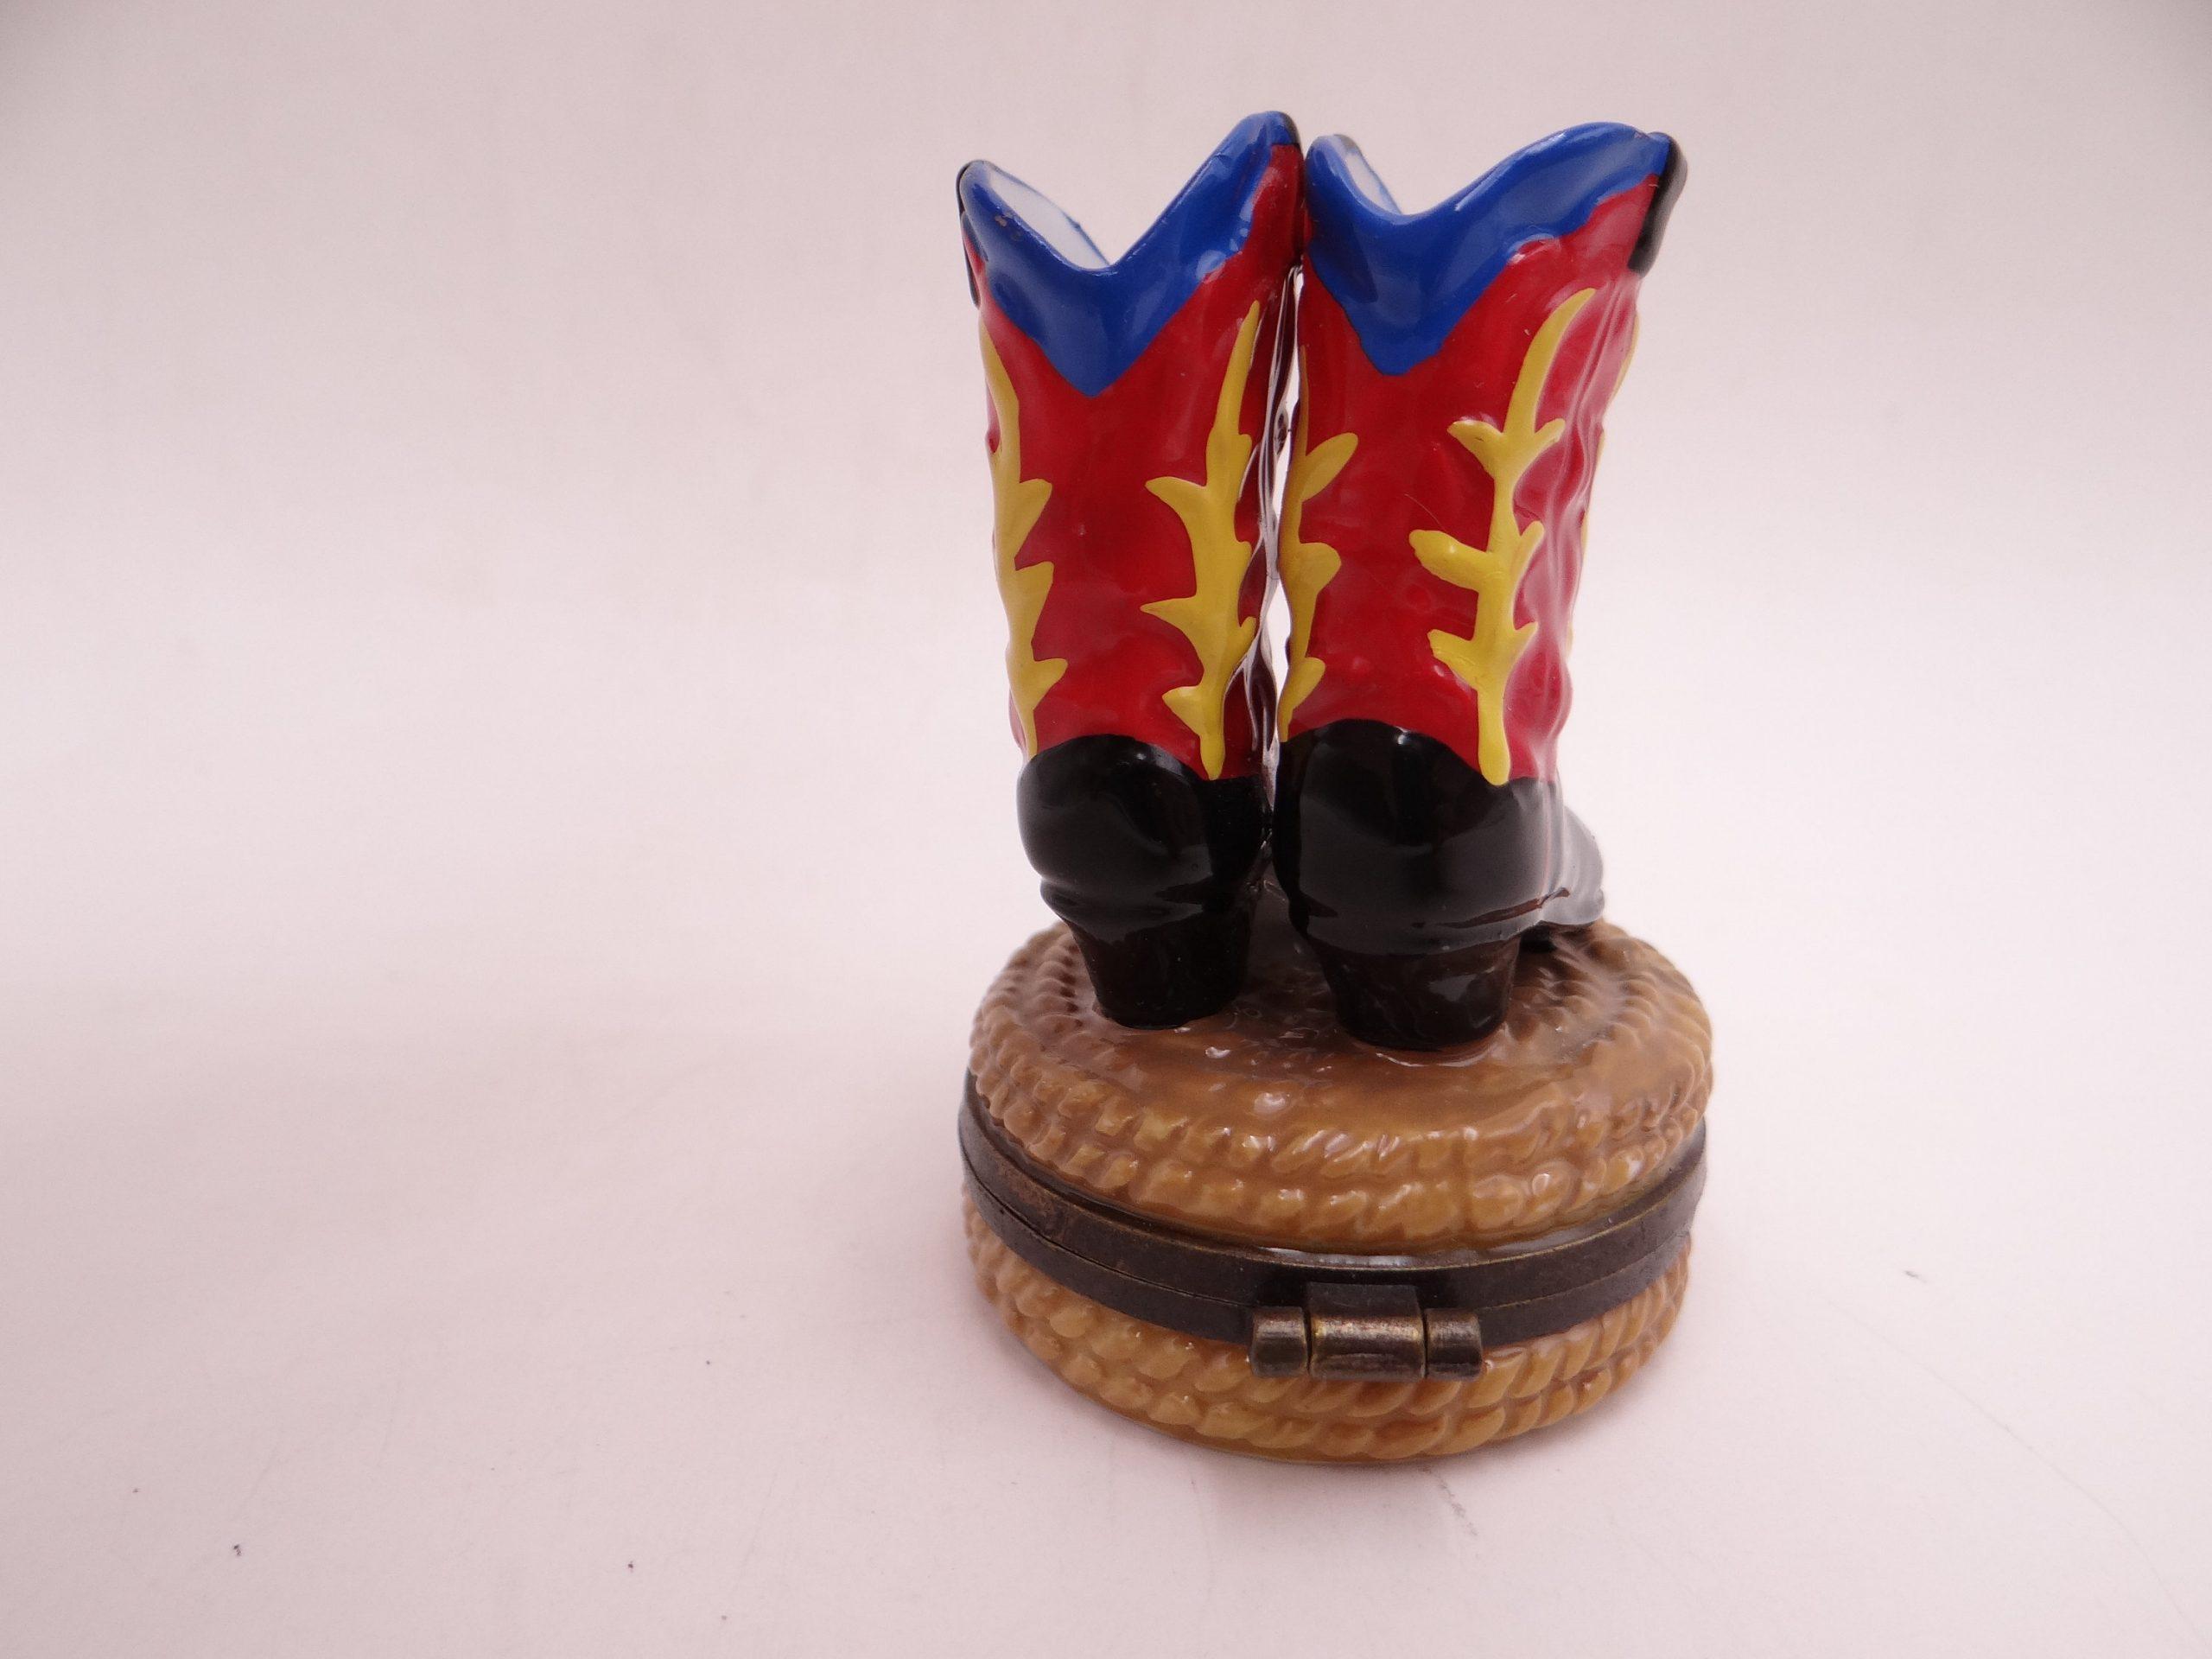 Vintage Cowboy Boots Trinket Box Or Pill Box Second Wind Vintage